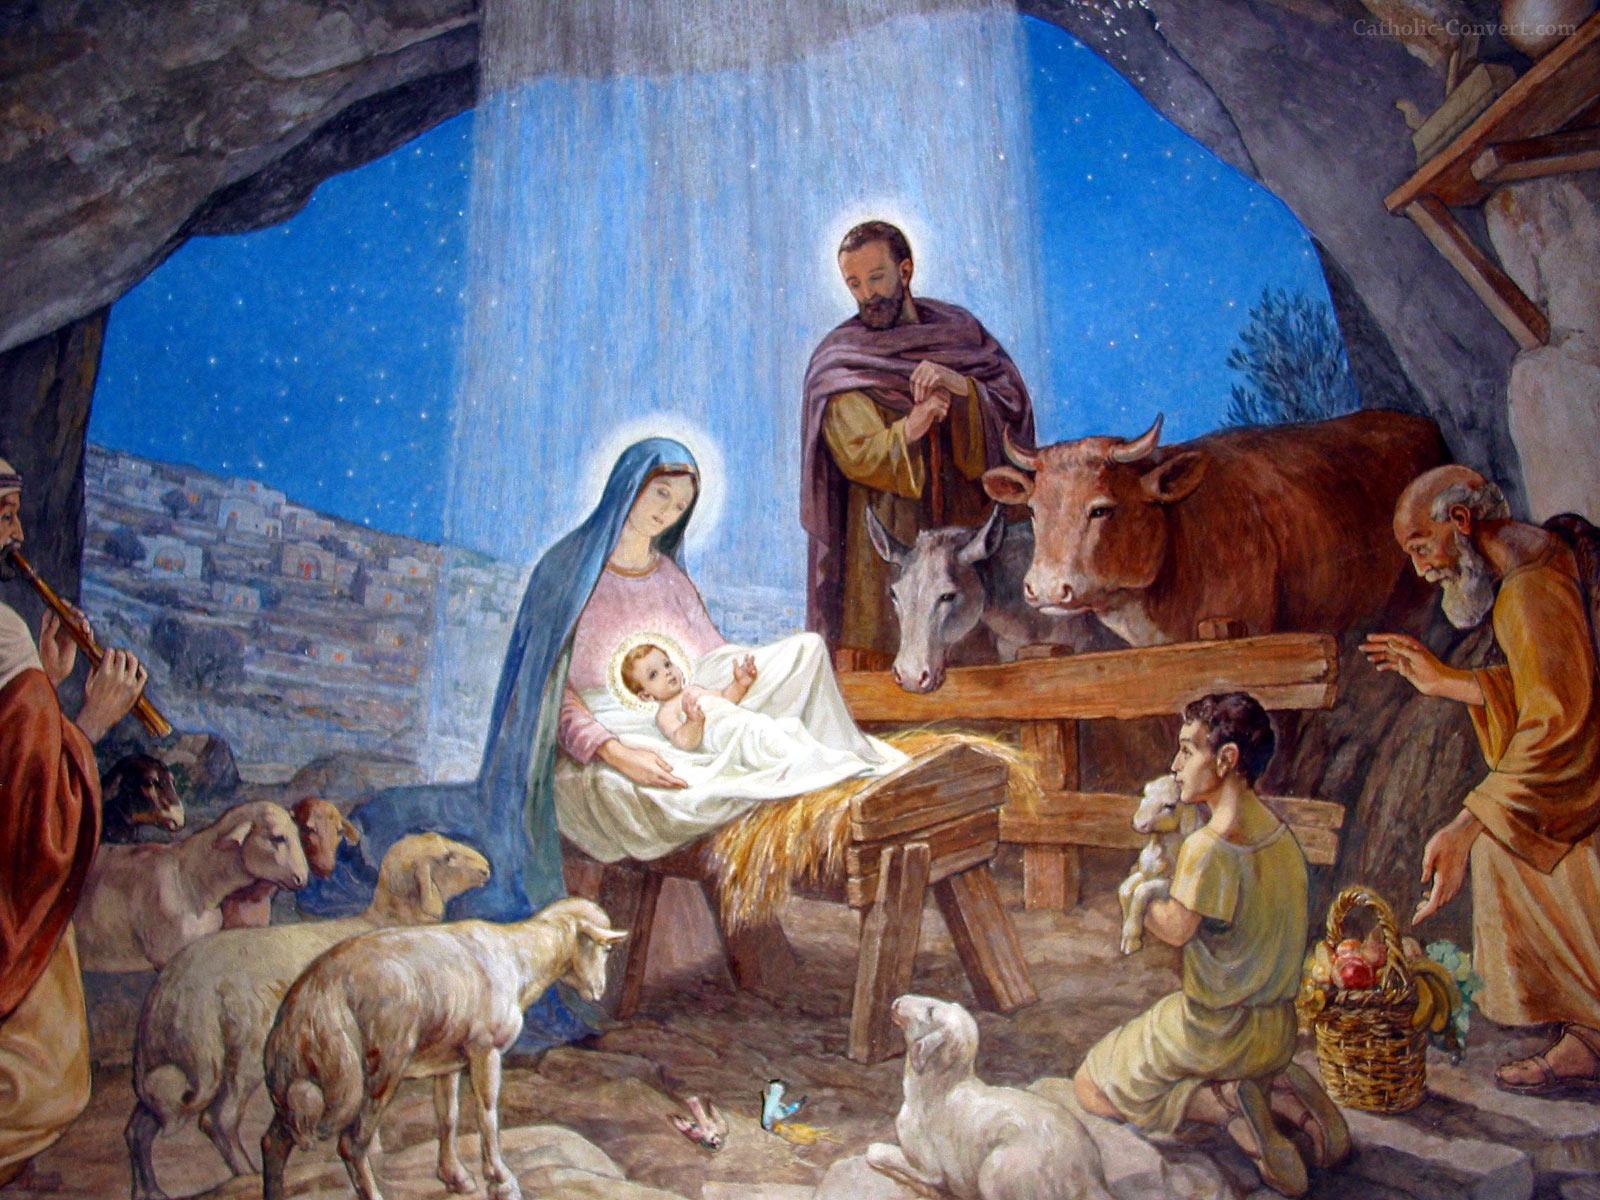 nativity 1600x1200 1600x1200